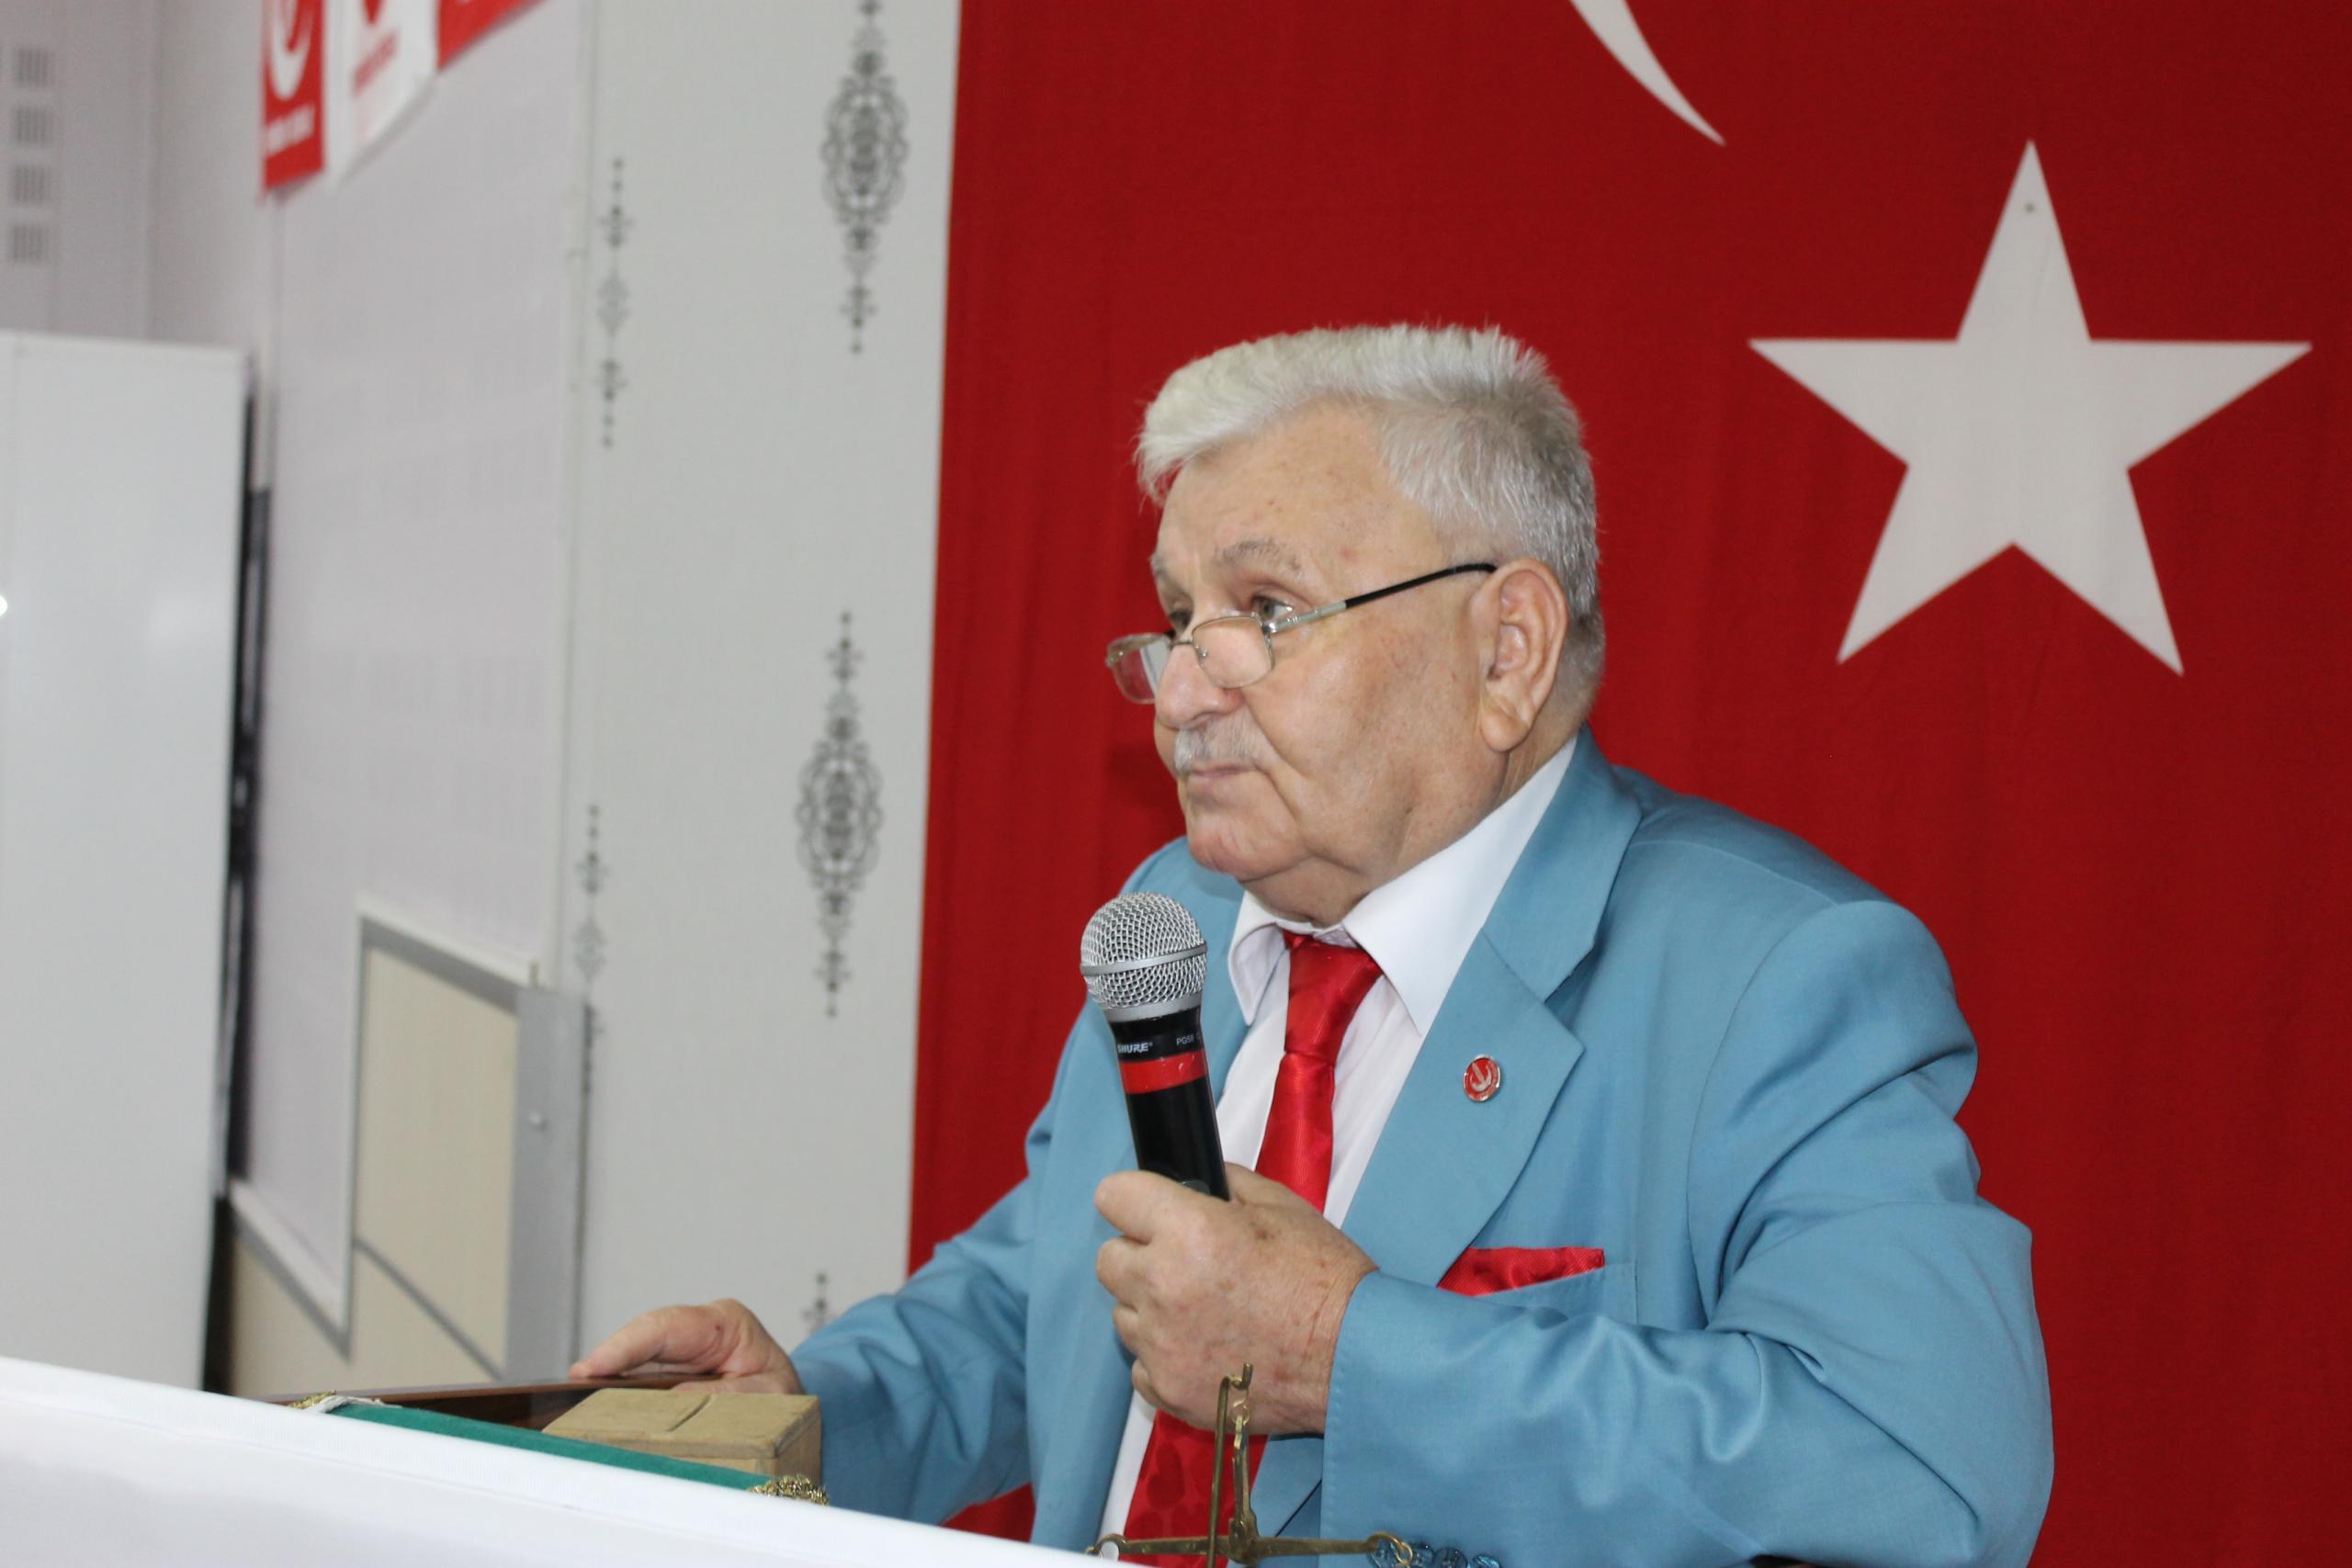 YRP İl Başkanı Mehmet Aras tan 19 Mayıs Kutlama Mesajı